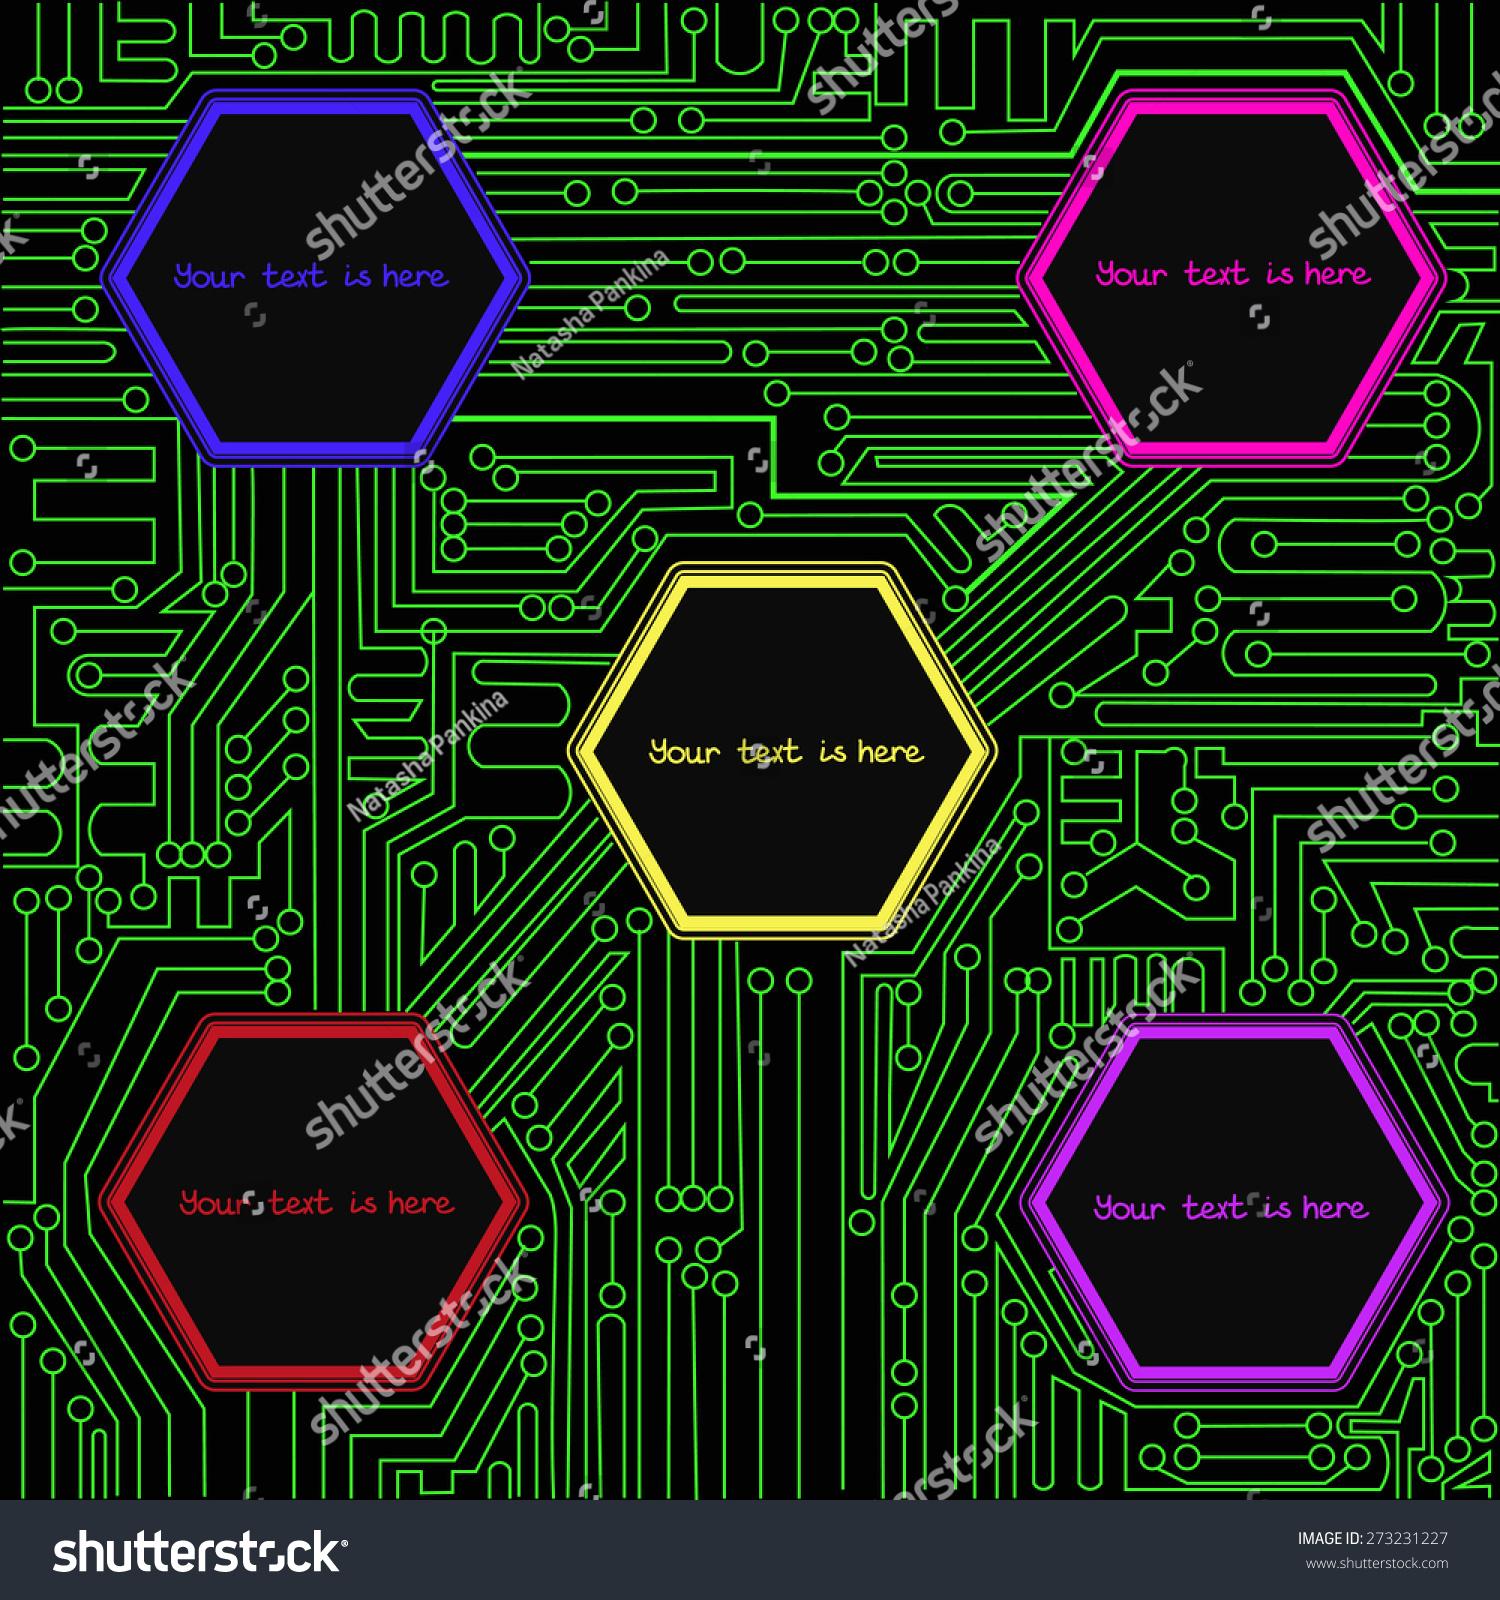 Diagram Stylized Printed Circuit Board Stock Illustration 273231227 ...